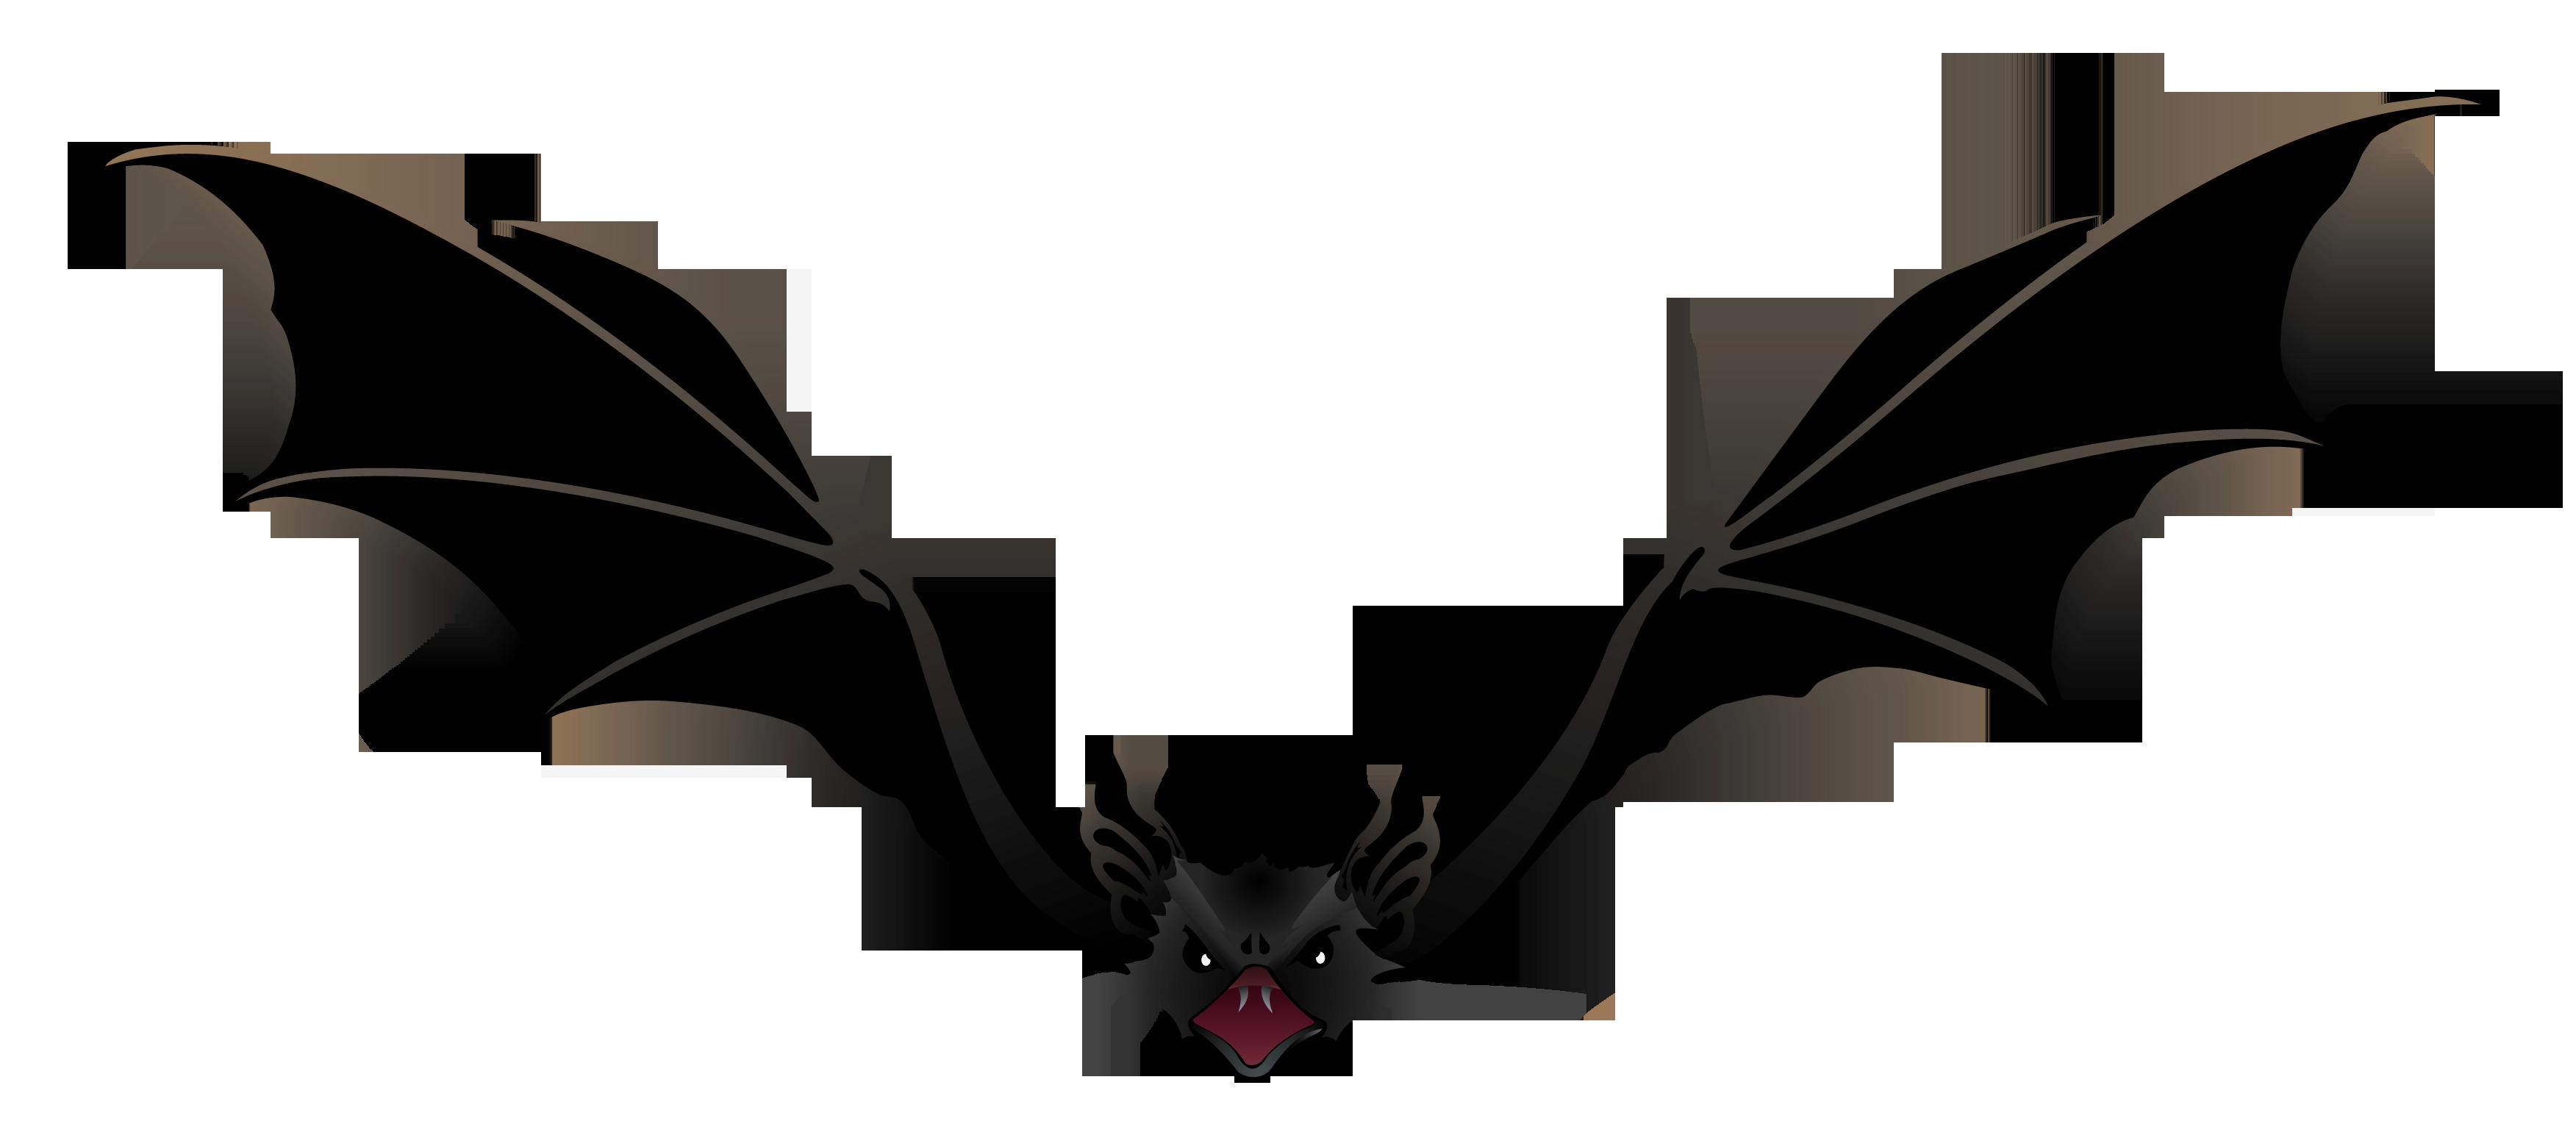 Creepy Bat Png Picture Png 3504 1529